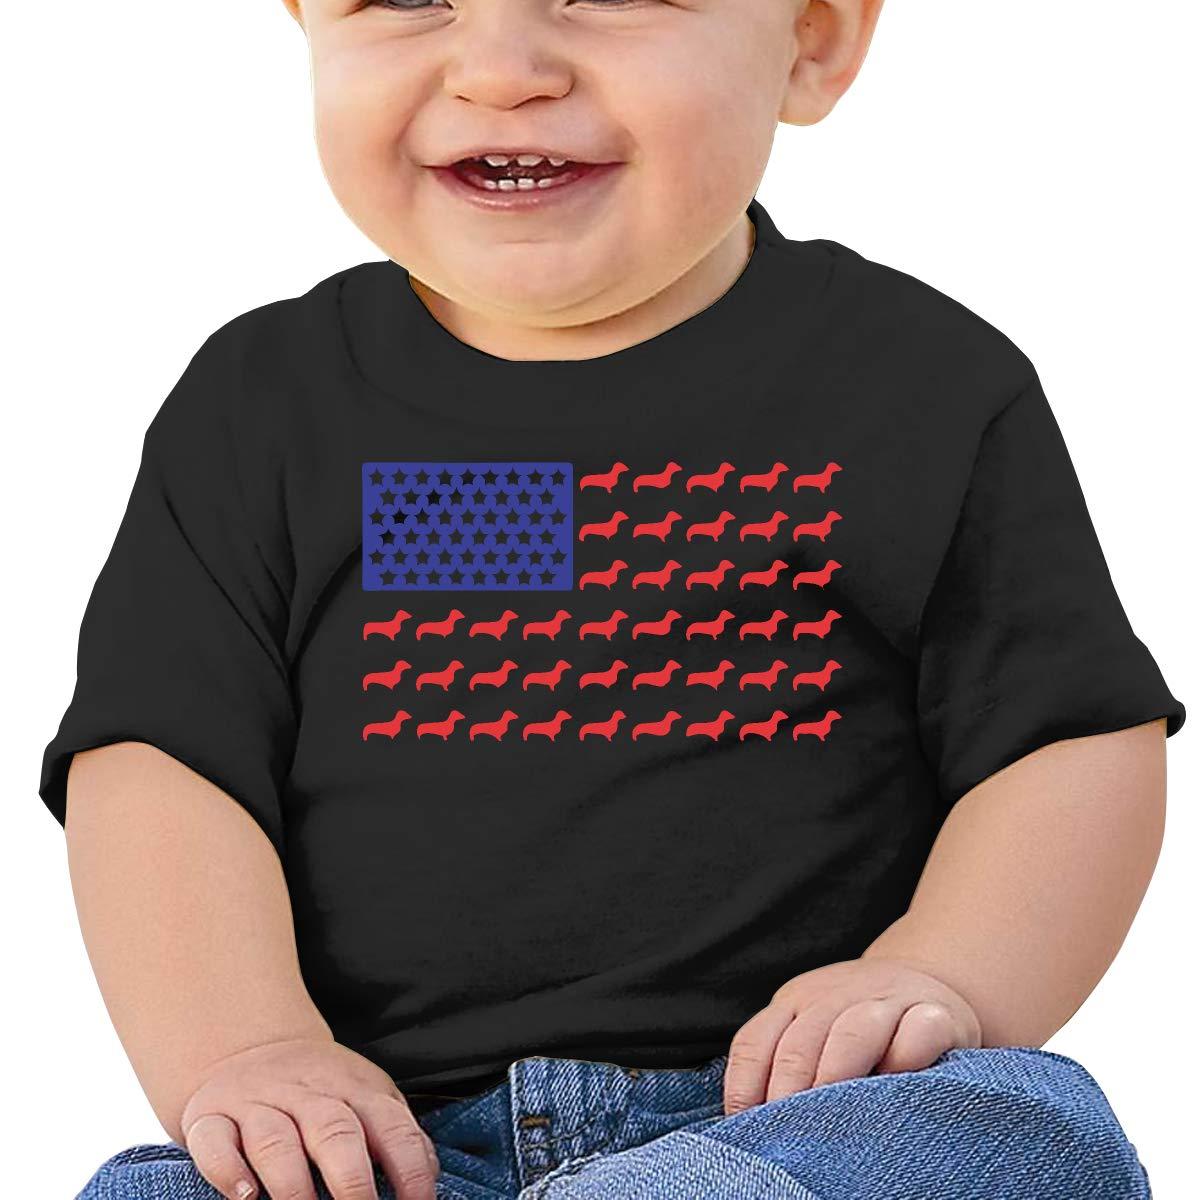 ZUGFGF-S3 Dachshund Dog American Flag Baby Boy Girl Newborn Short Sleeve T-Shirt 6-24 Month Cotton Tops